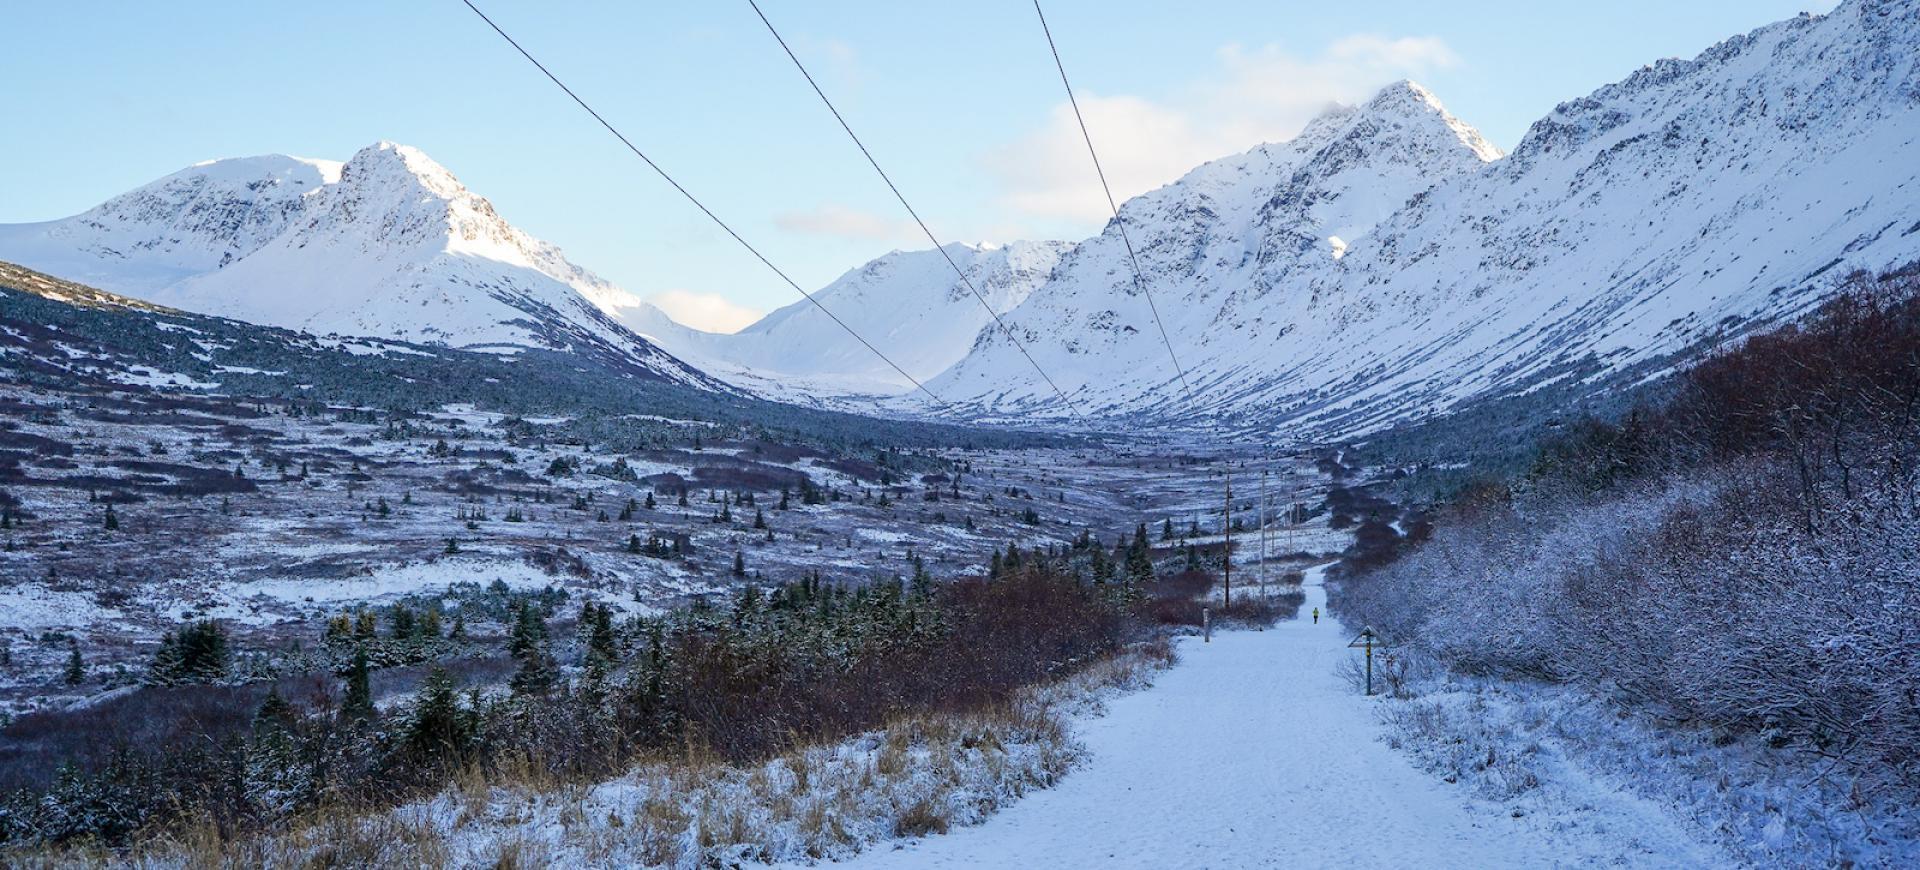 góry-alaska-zima